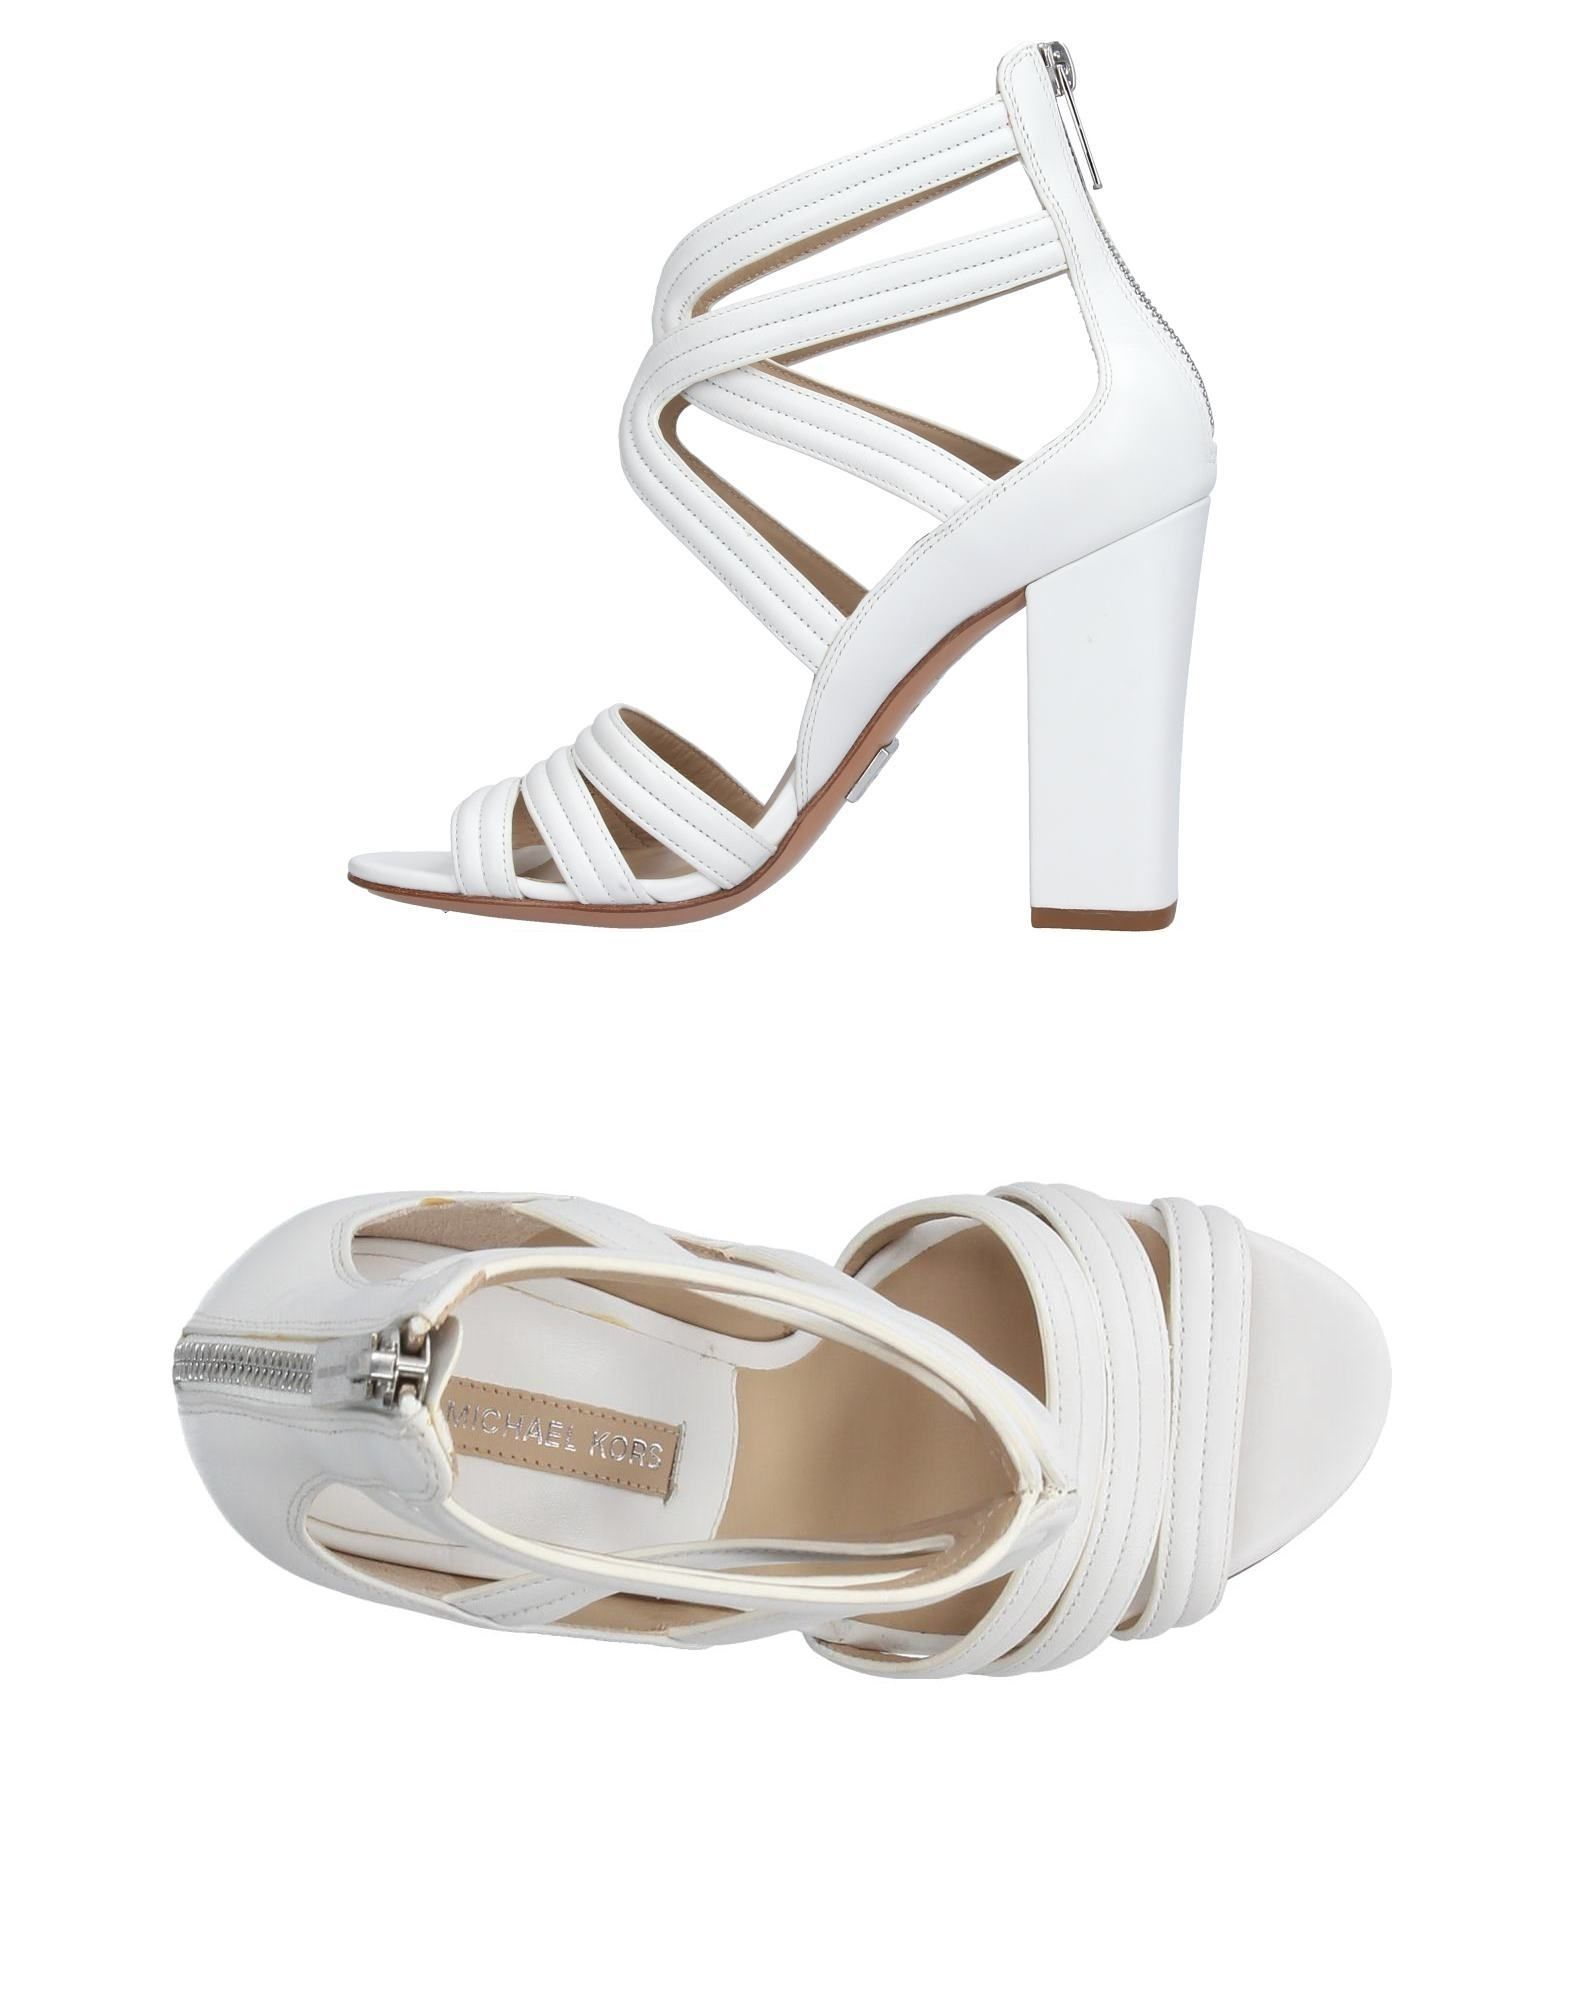 michael kors female michael kors sandals